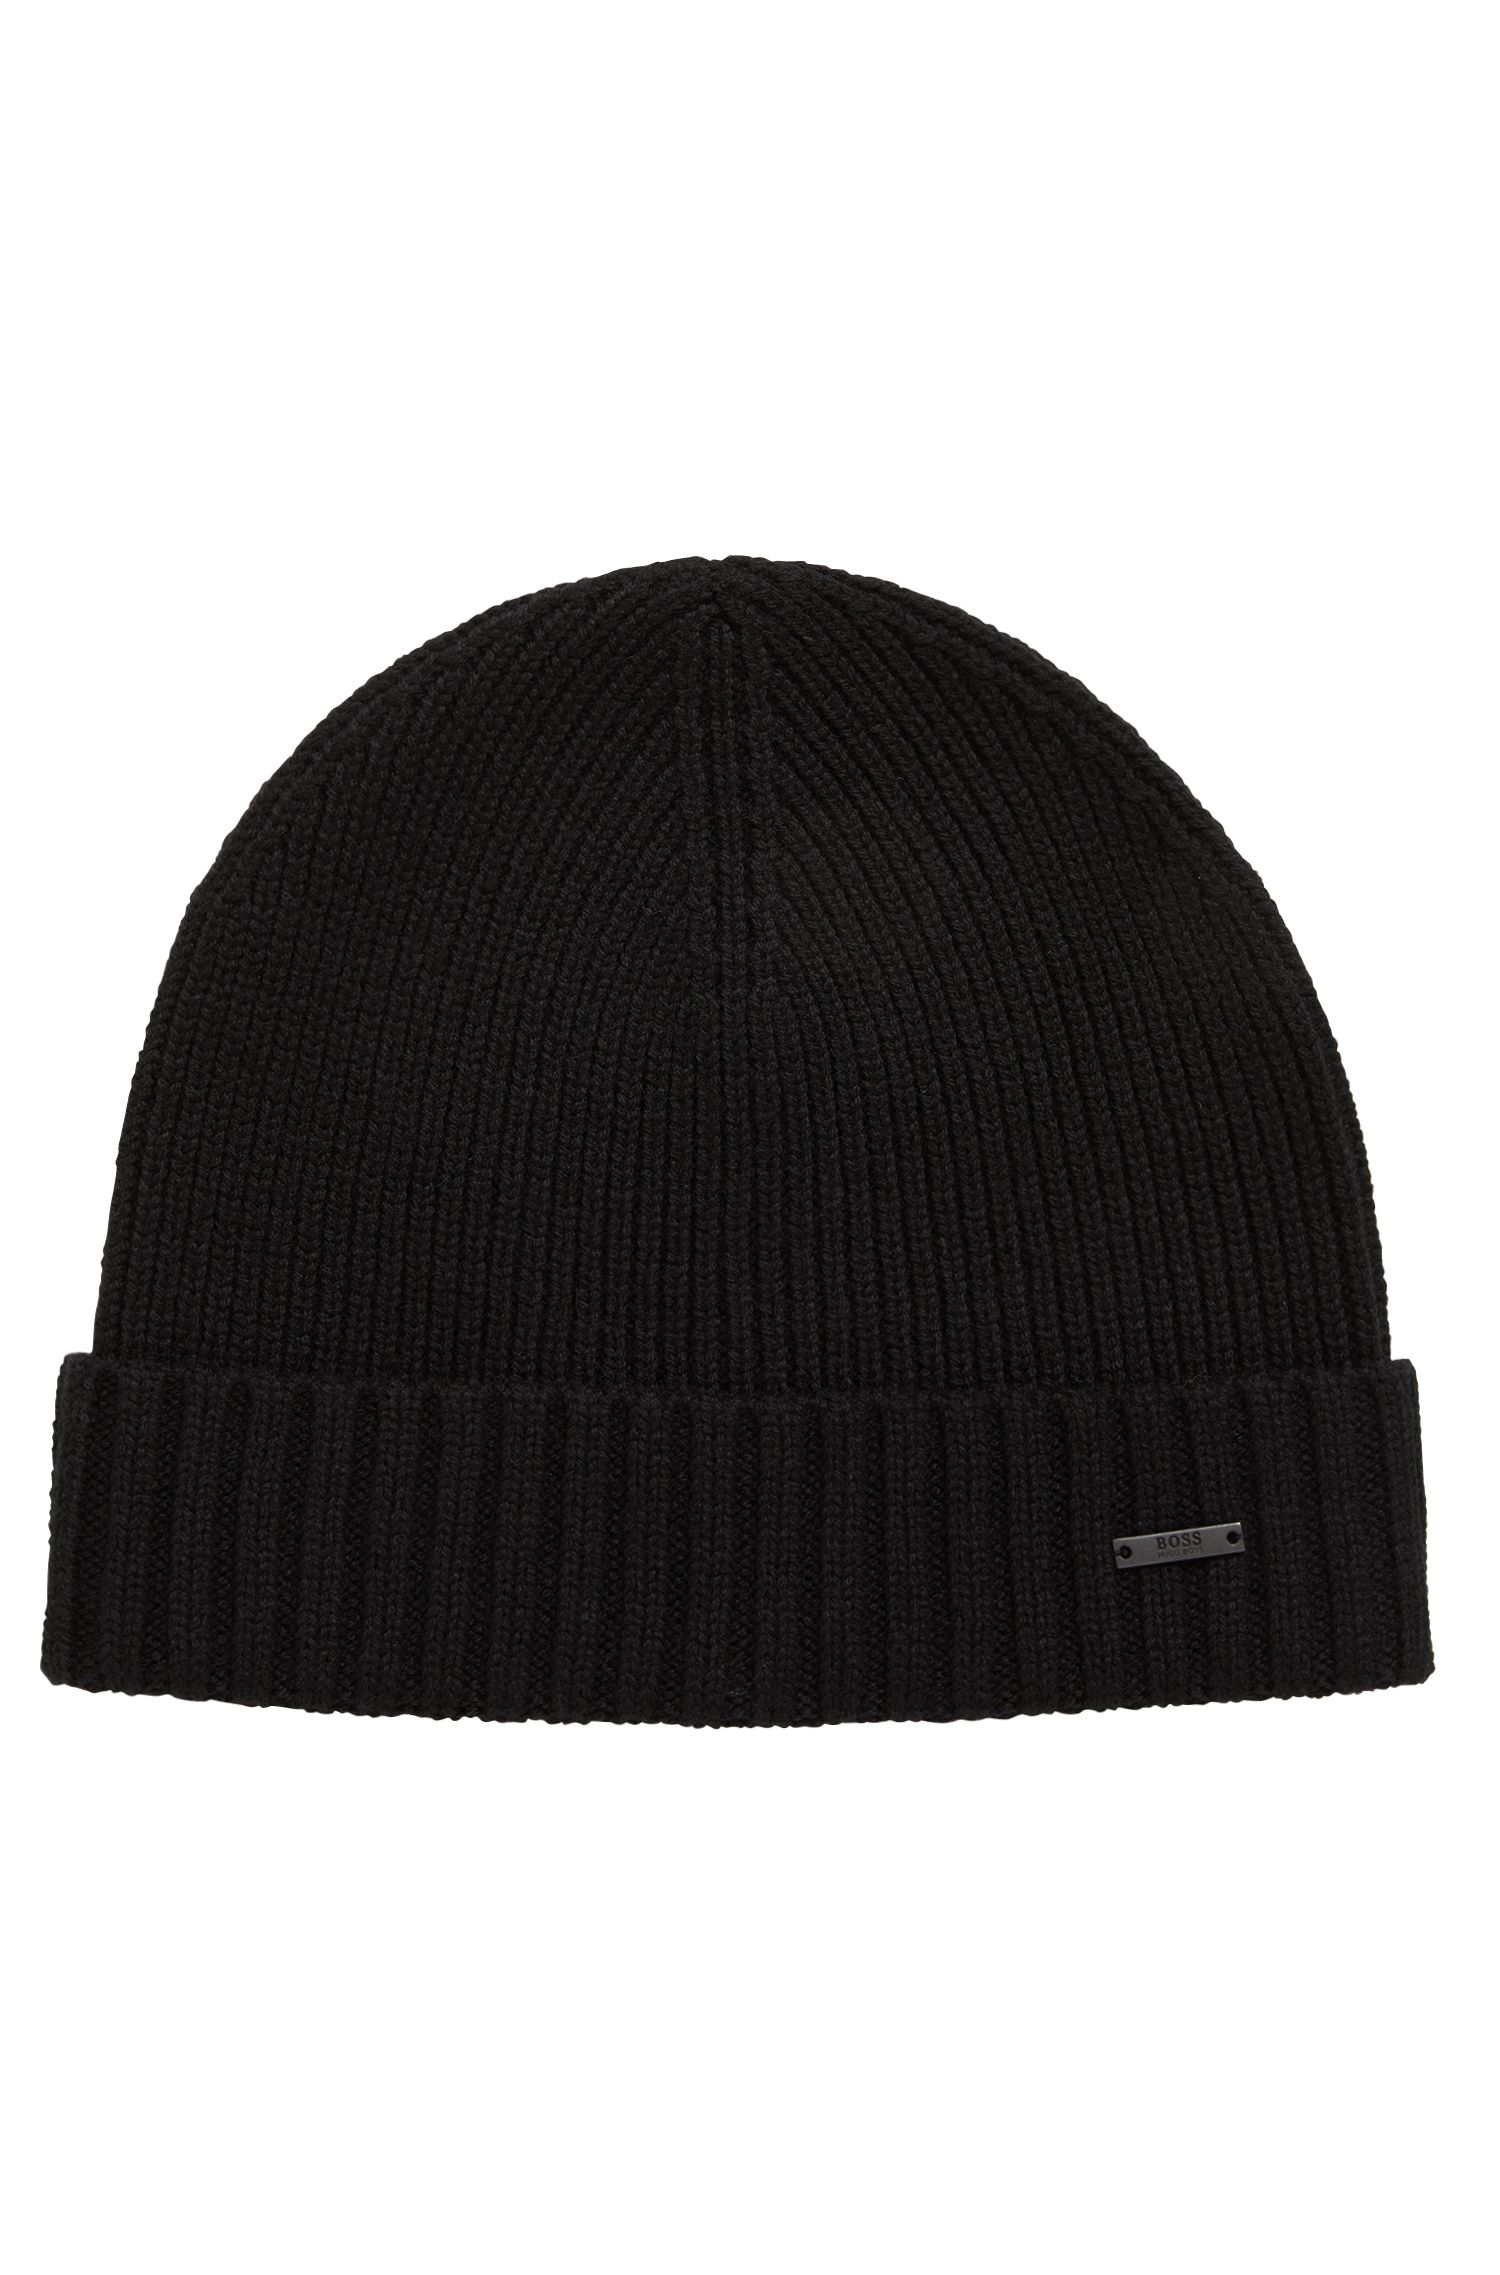 Gorro de punto en lana virgen con insignia metálica, Negro